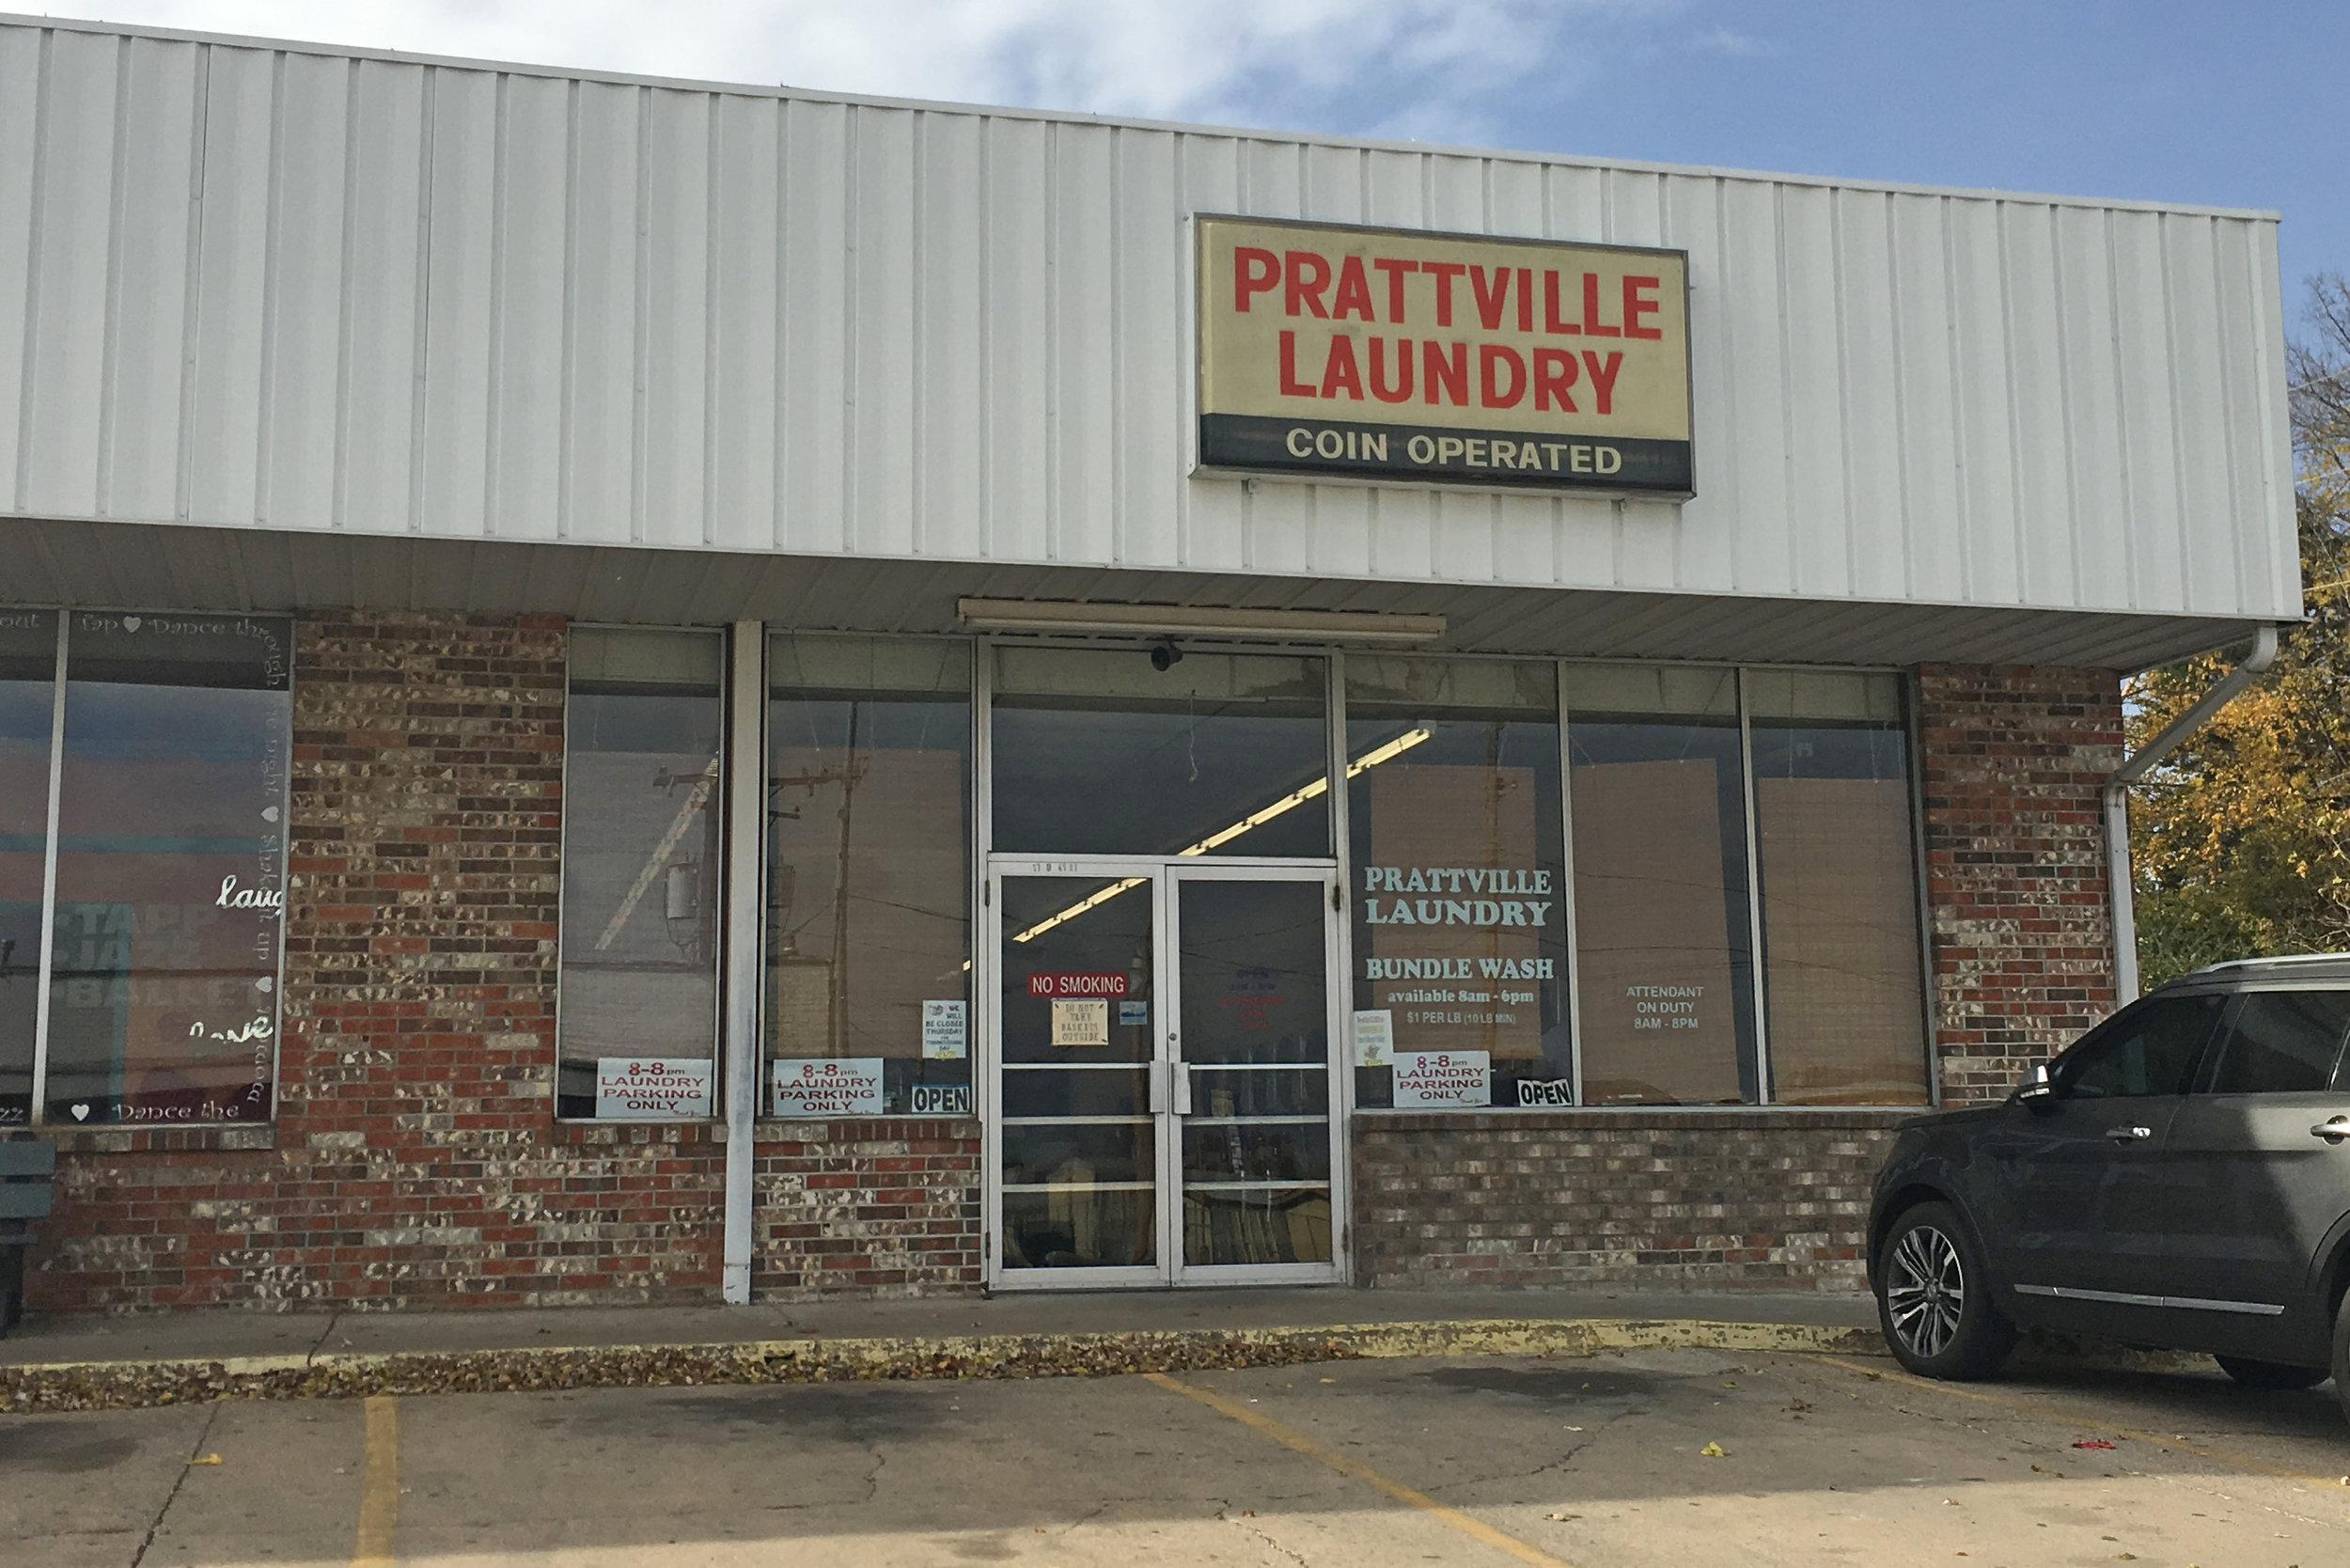 prattville laundry - prattville market 17 west 41st street